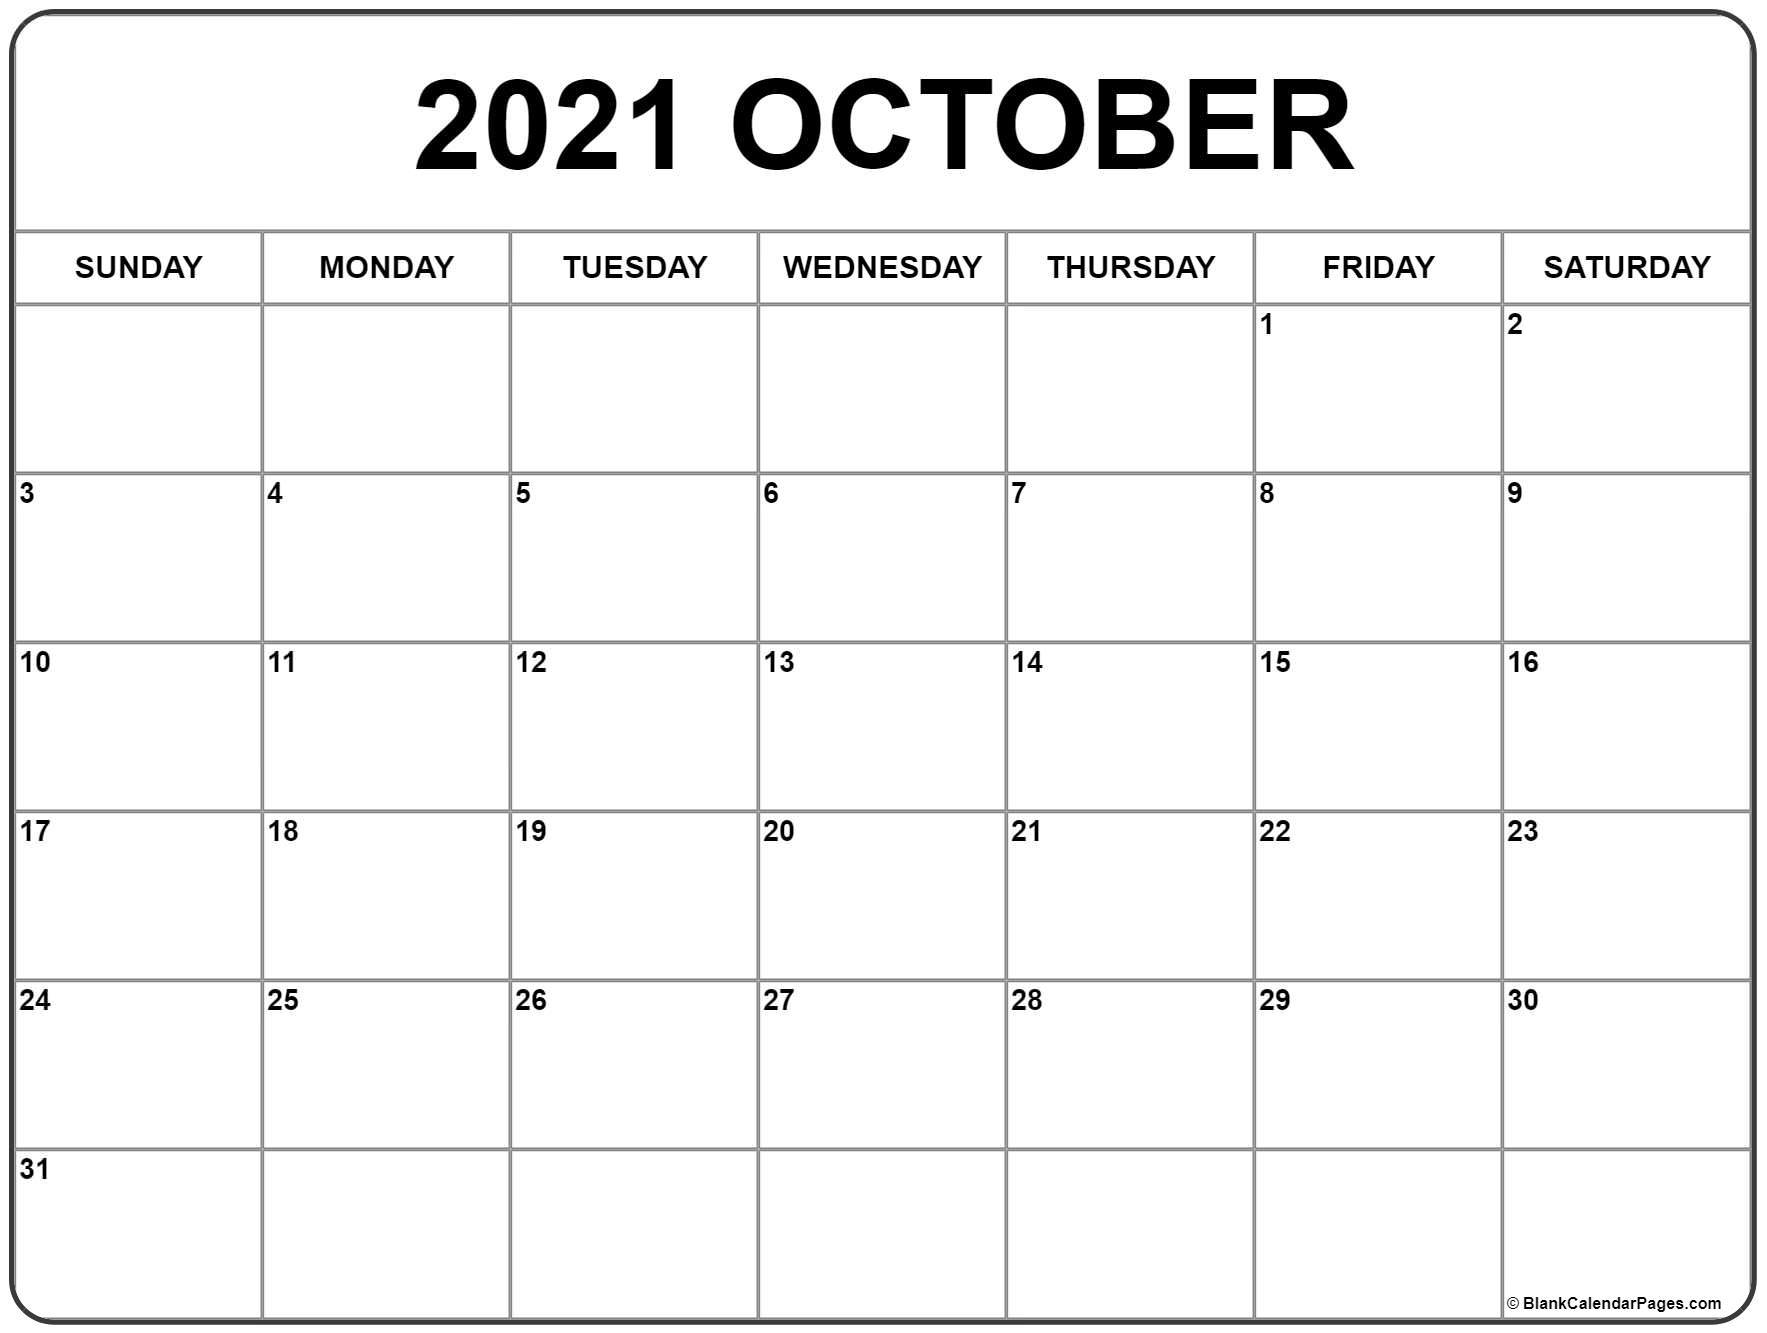 Get August September October 2021 Calendar Printable